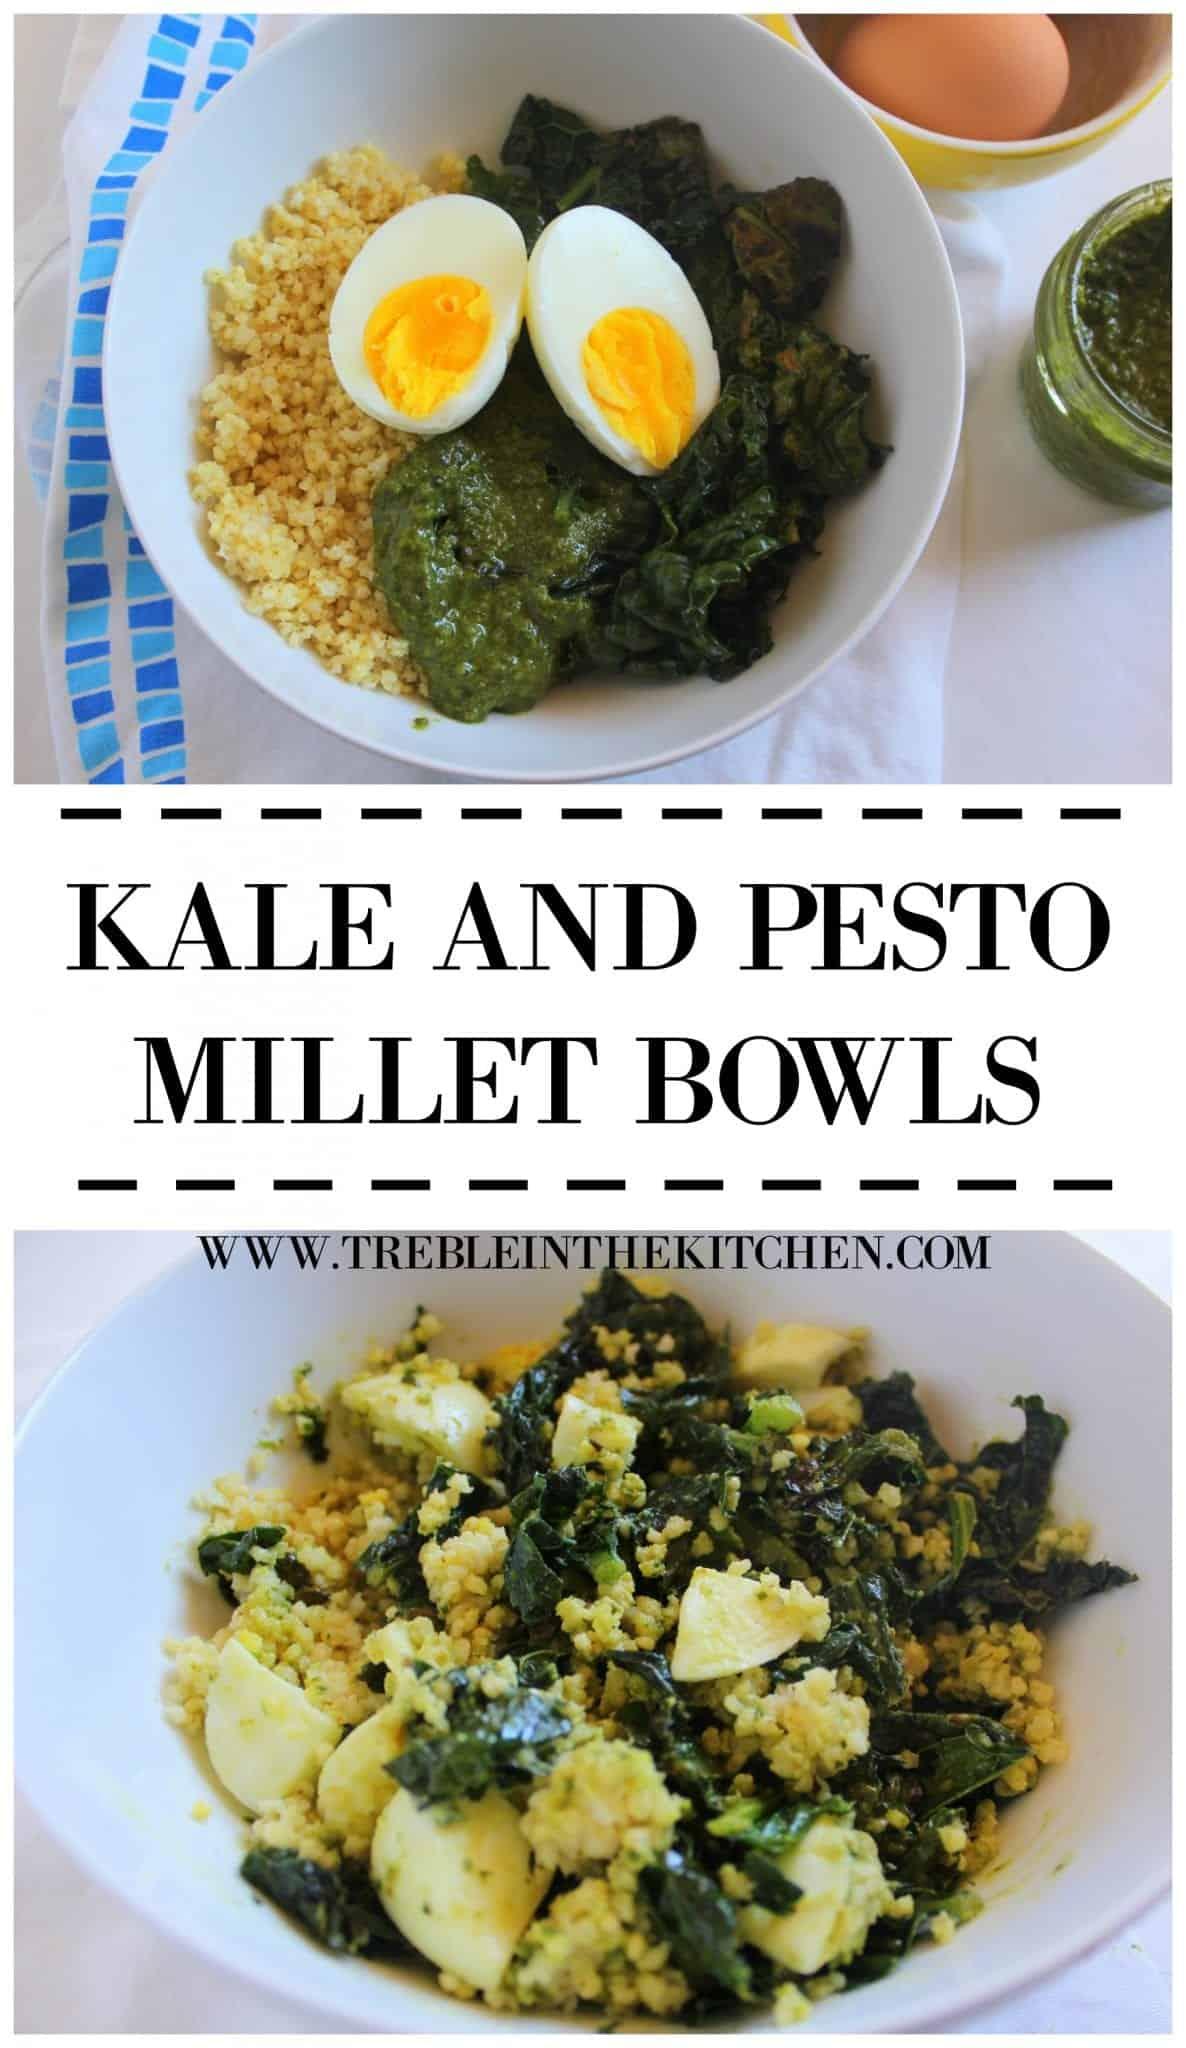 kale and pesto millet bowls via treble in the kitchen